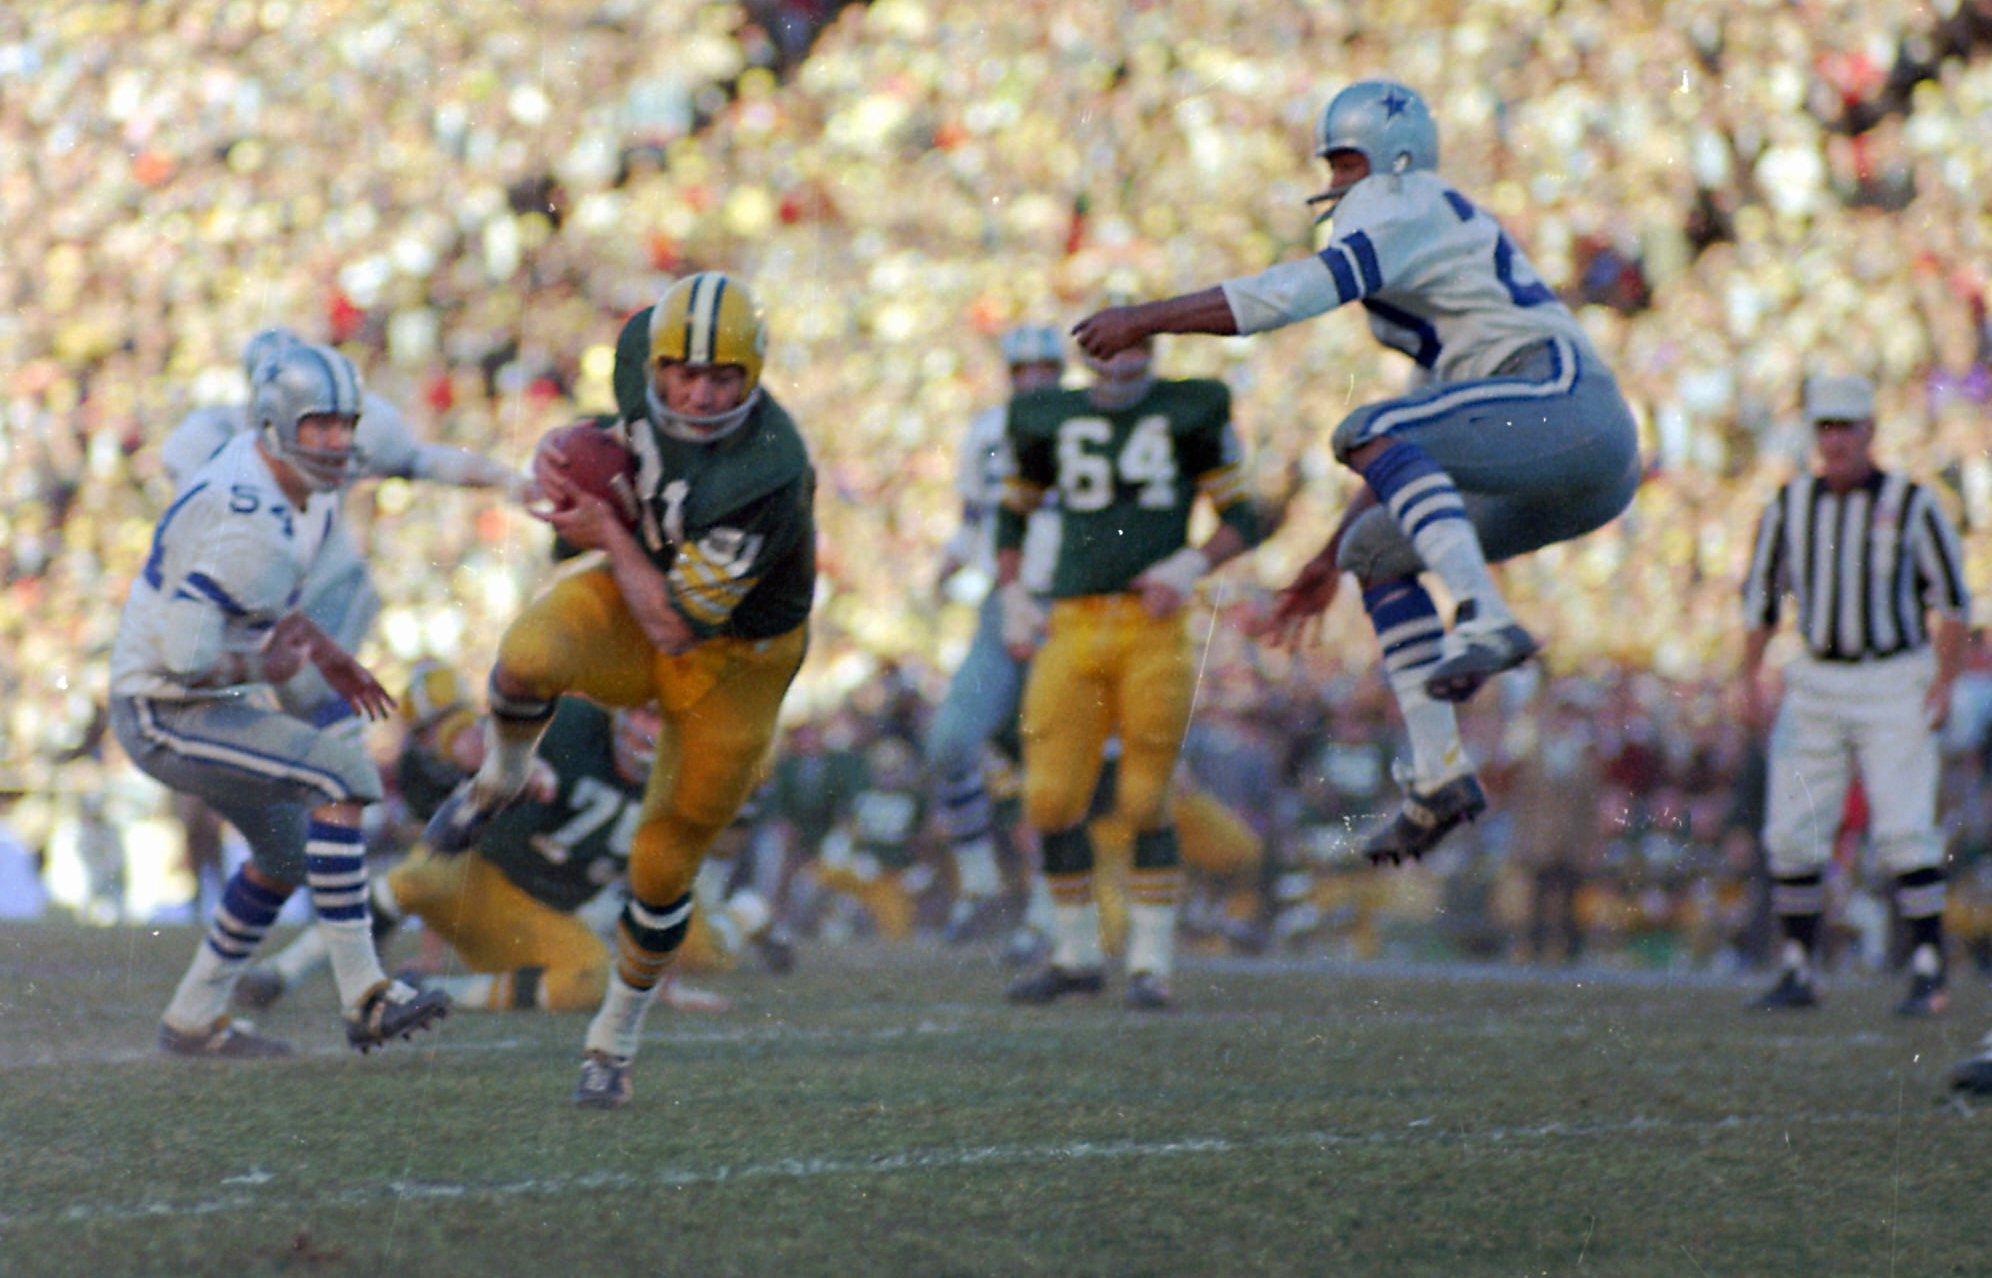 Green Bay Packers vs. Dallas Cowboys in 1967